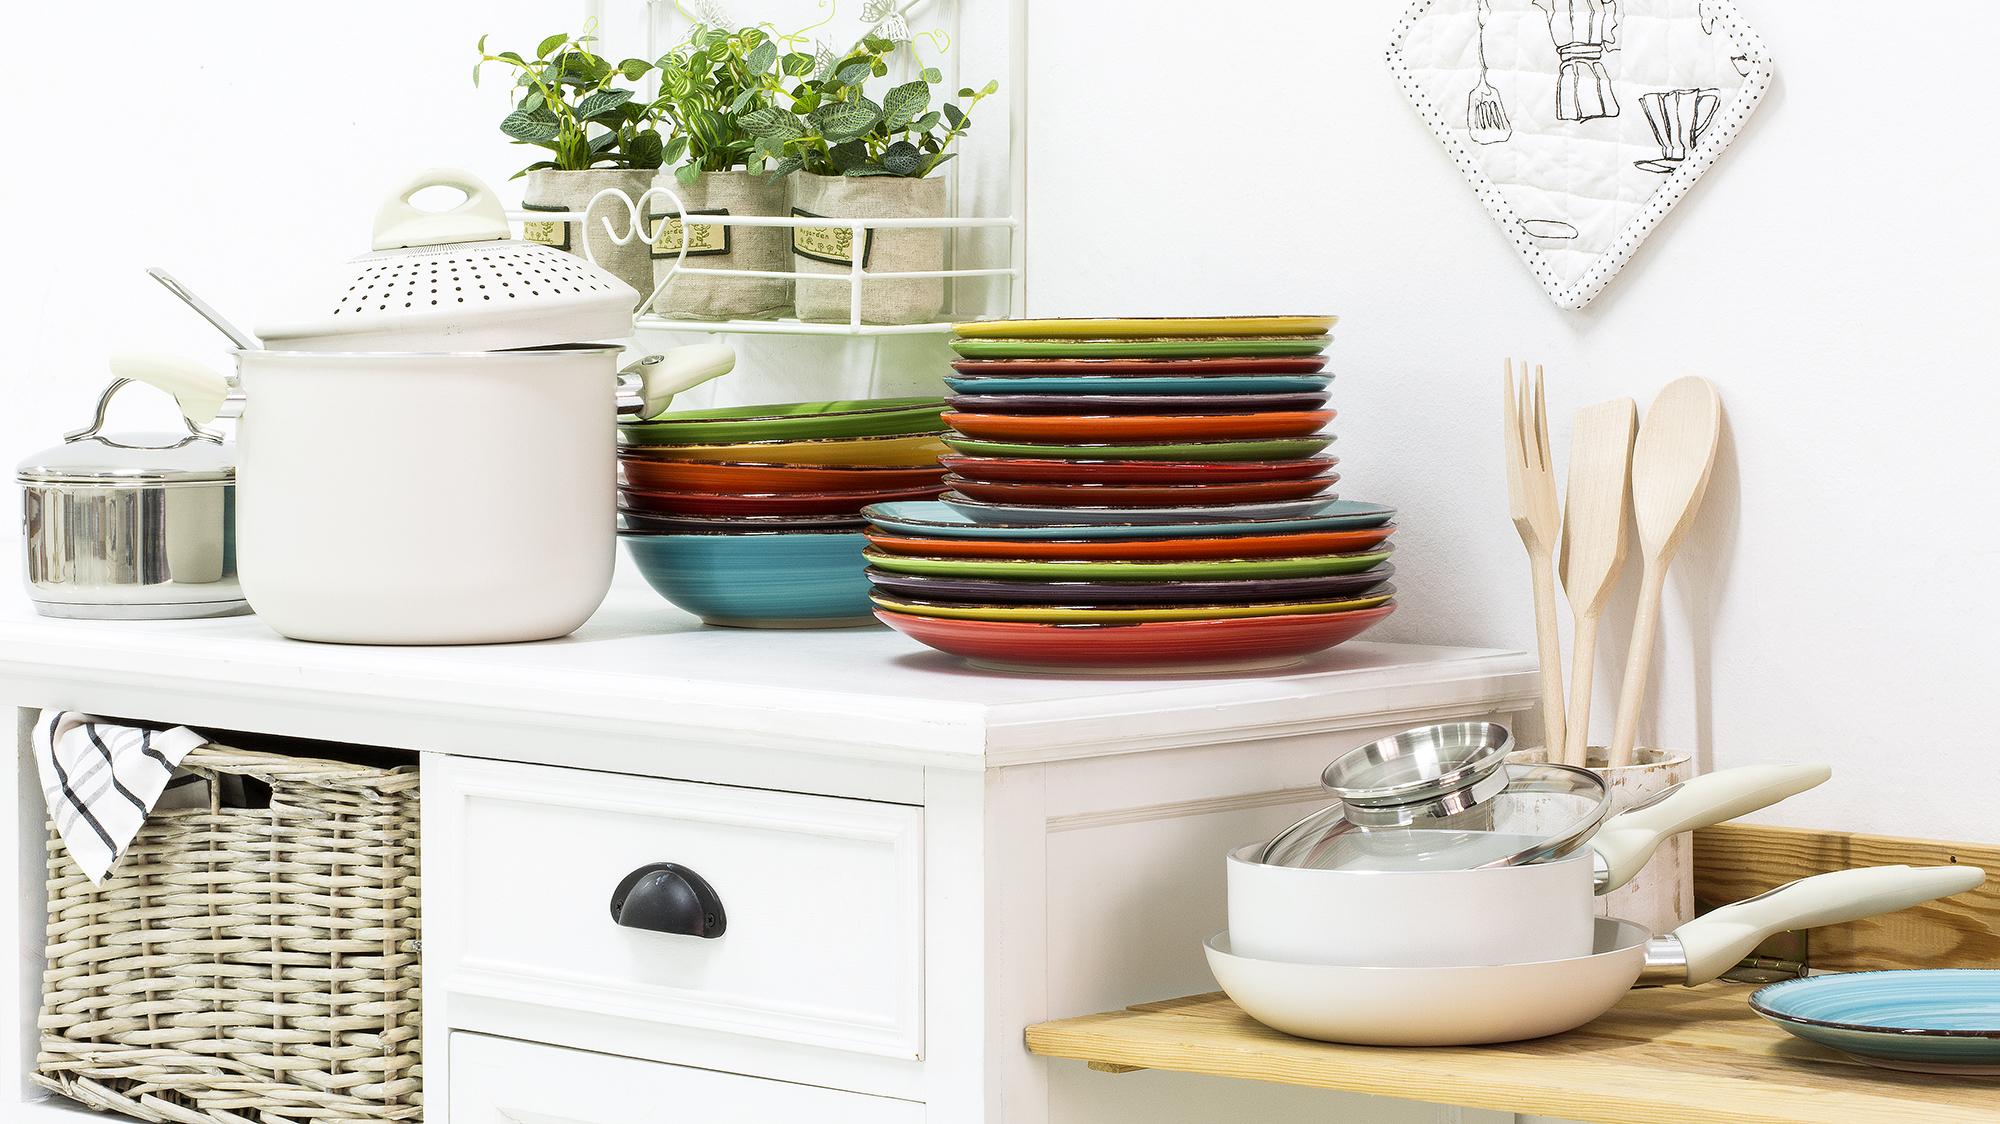 Разноцветная кухонная посуда